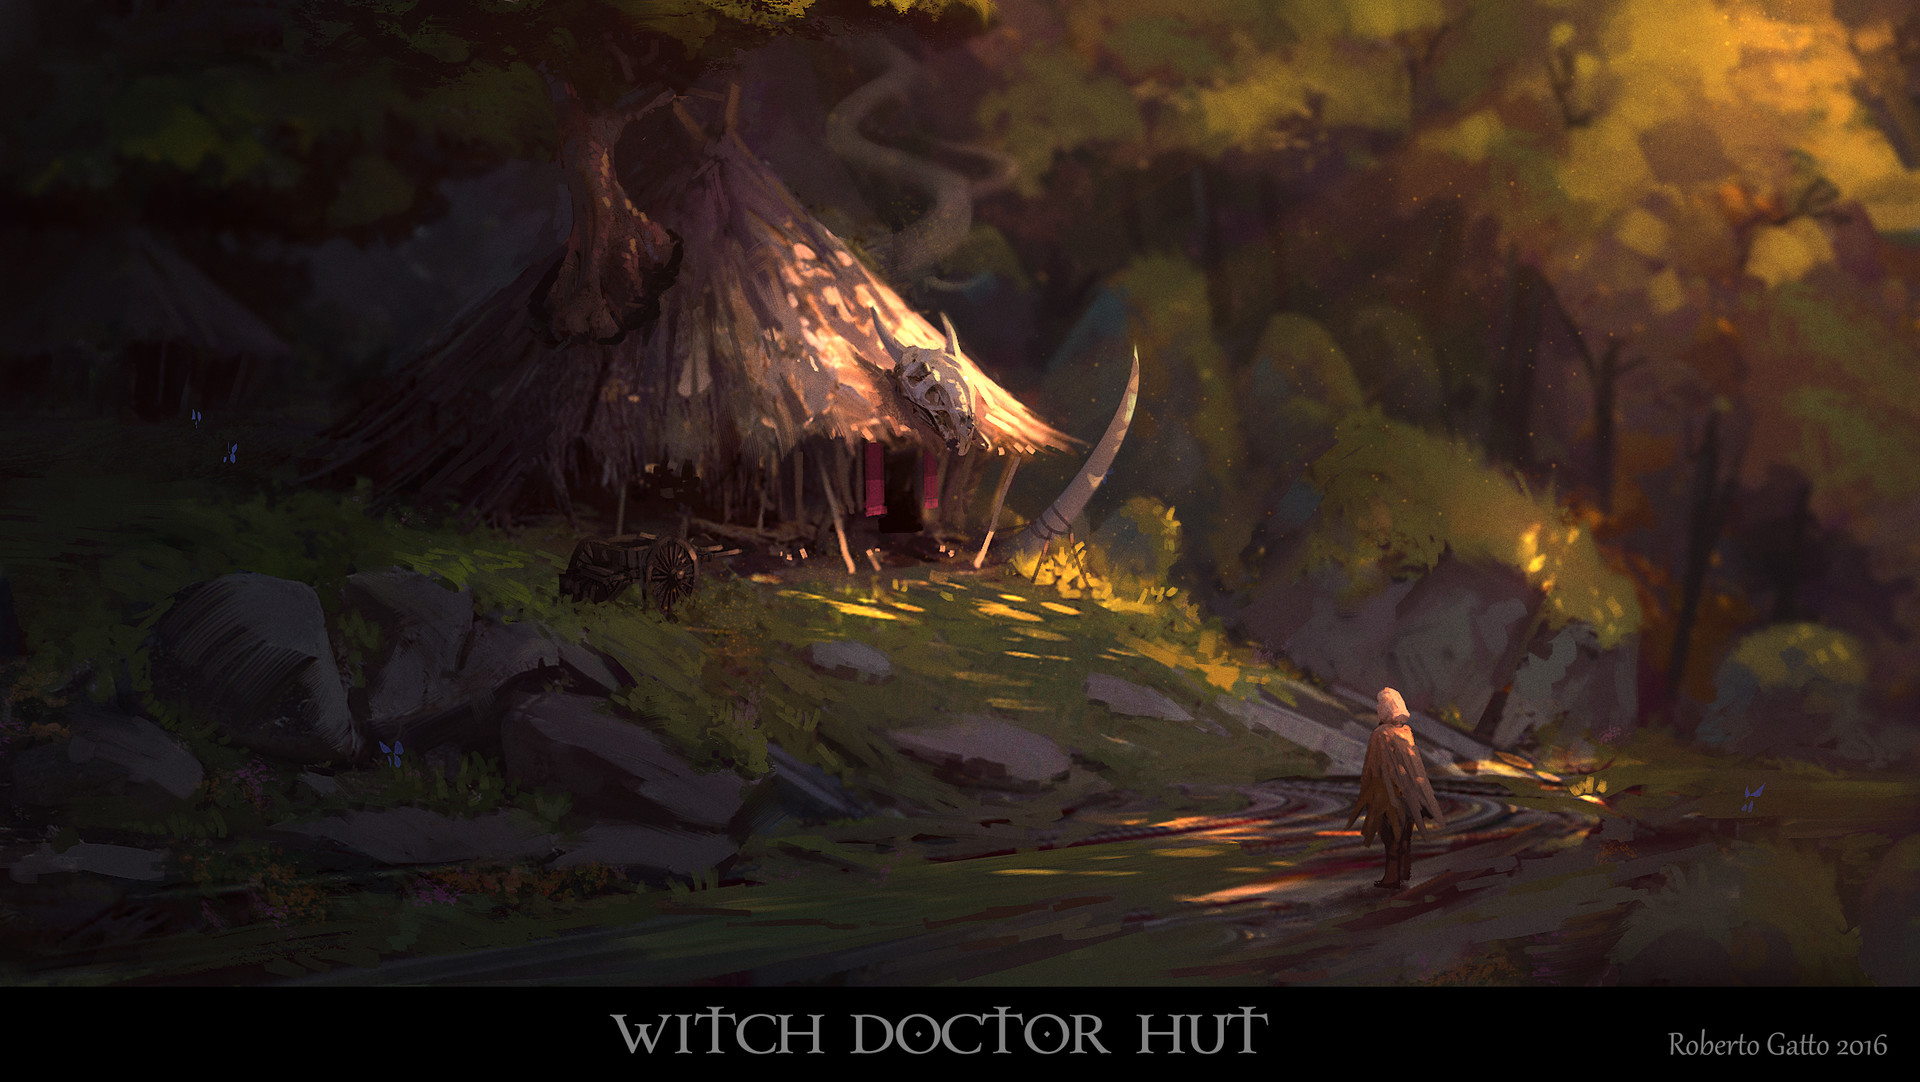 Roberto gatto witch doctor hut concept